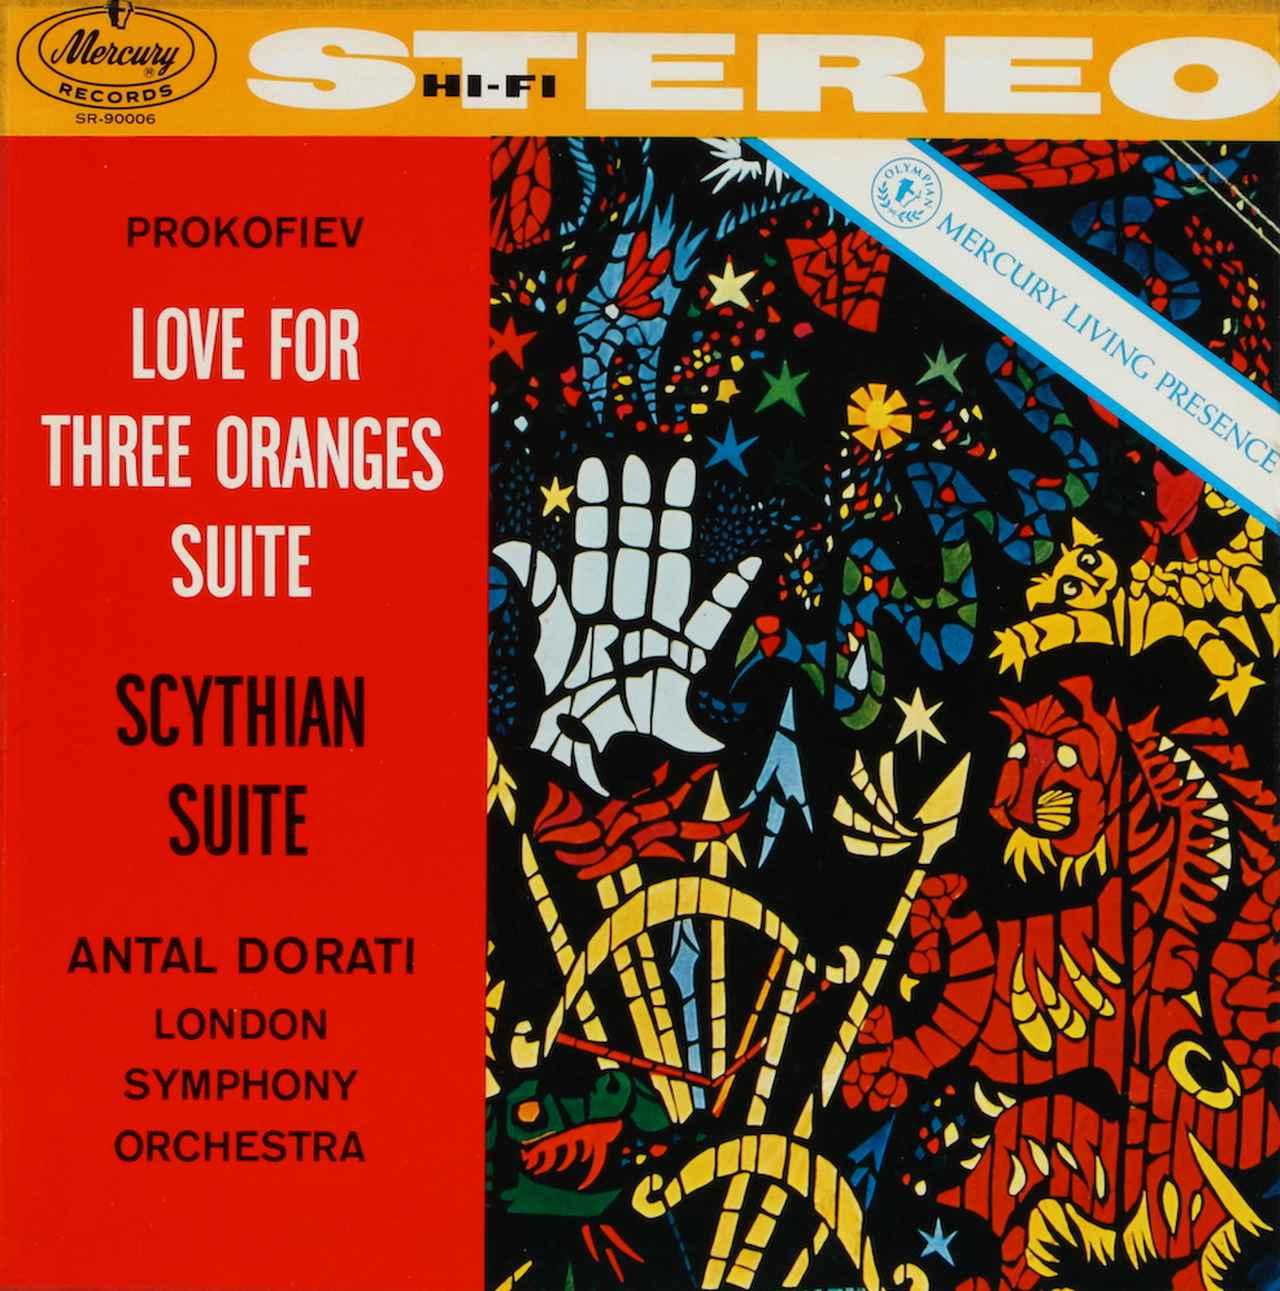 Images : 6番目の画像 - オーディオ名盤コレクション最新作 - Stereo Sound ONLINE